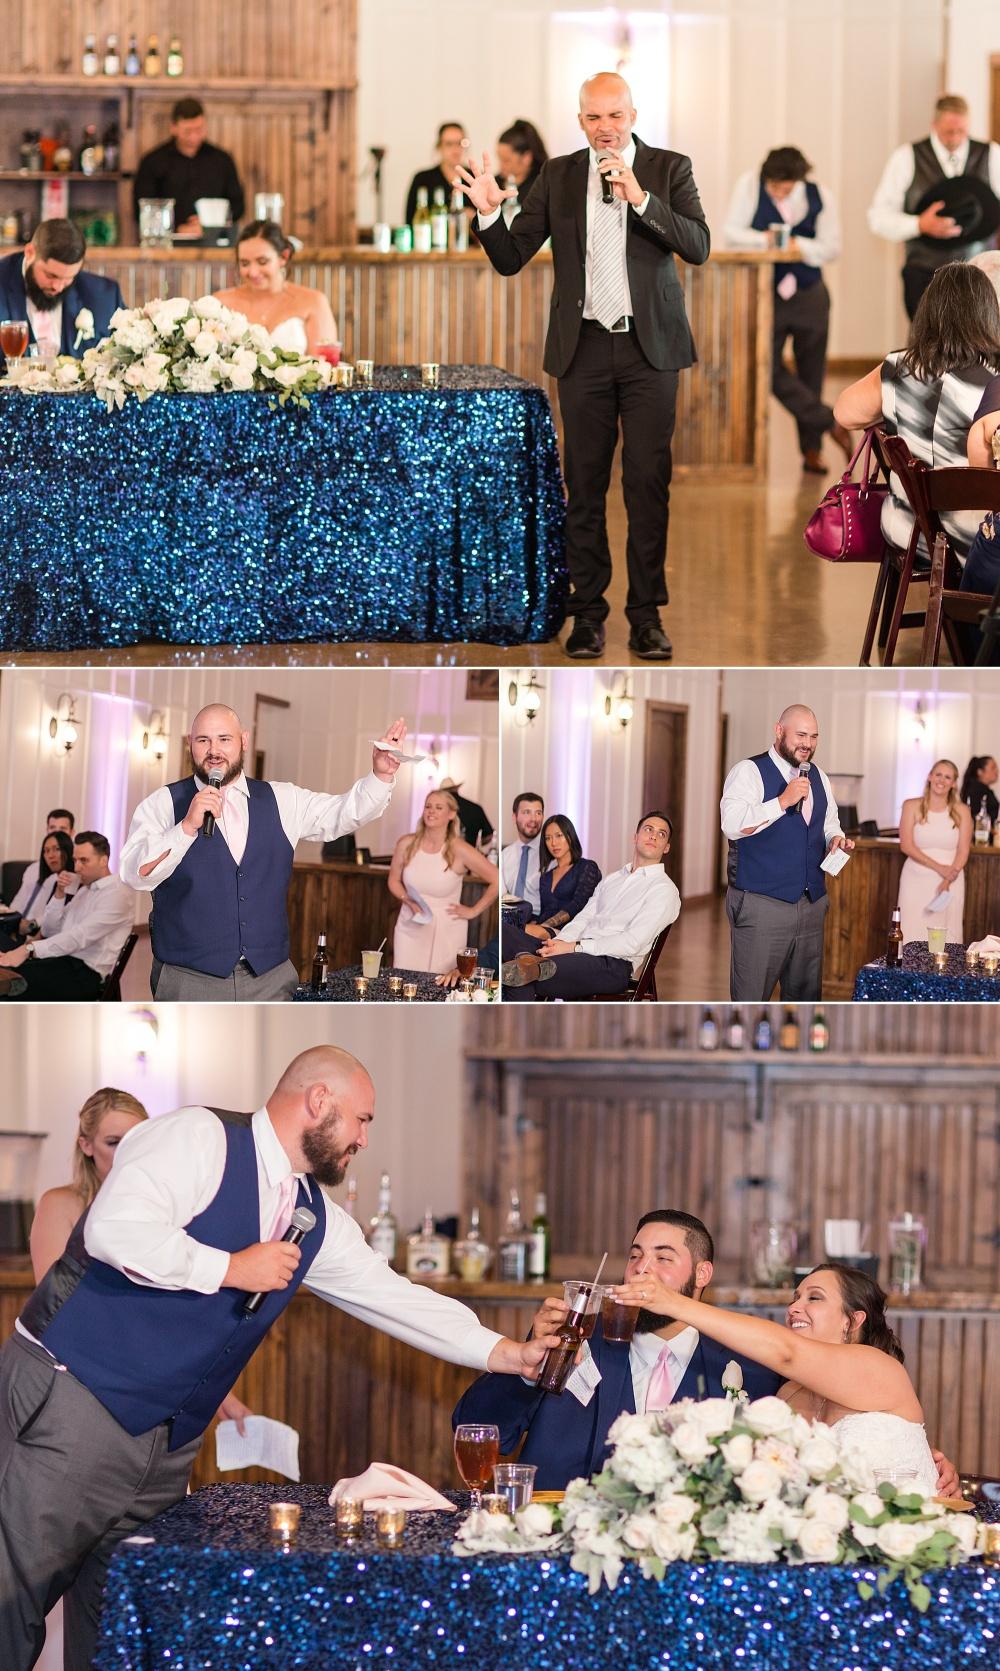 Wedding-Photographer-Bulverde-Texas-Western-Sky-Event-Venue-Carly-Barton-Photography_0070.jpg